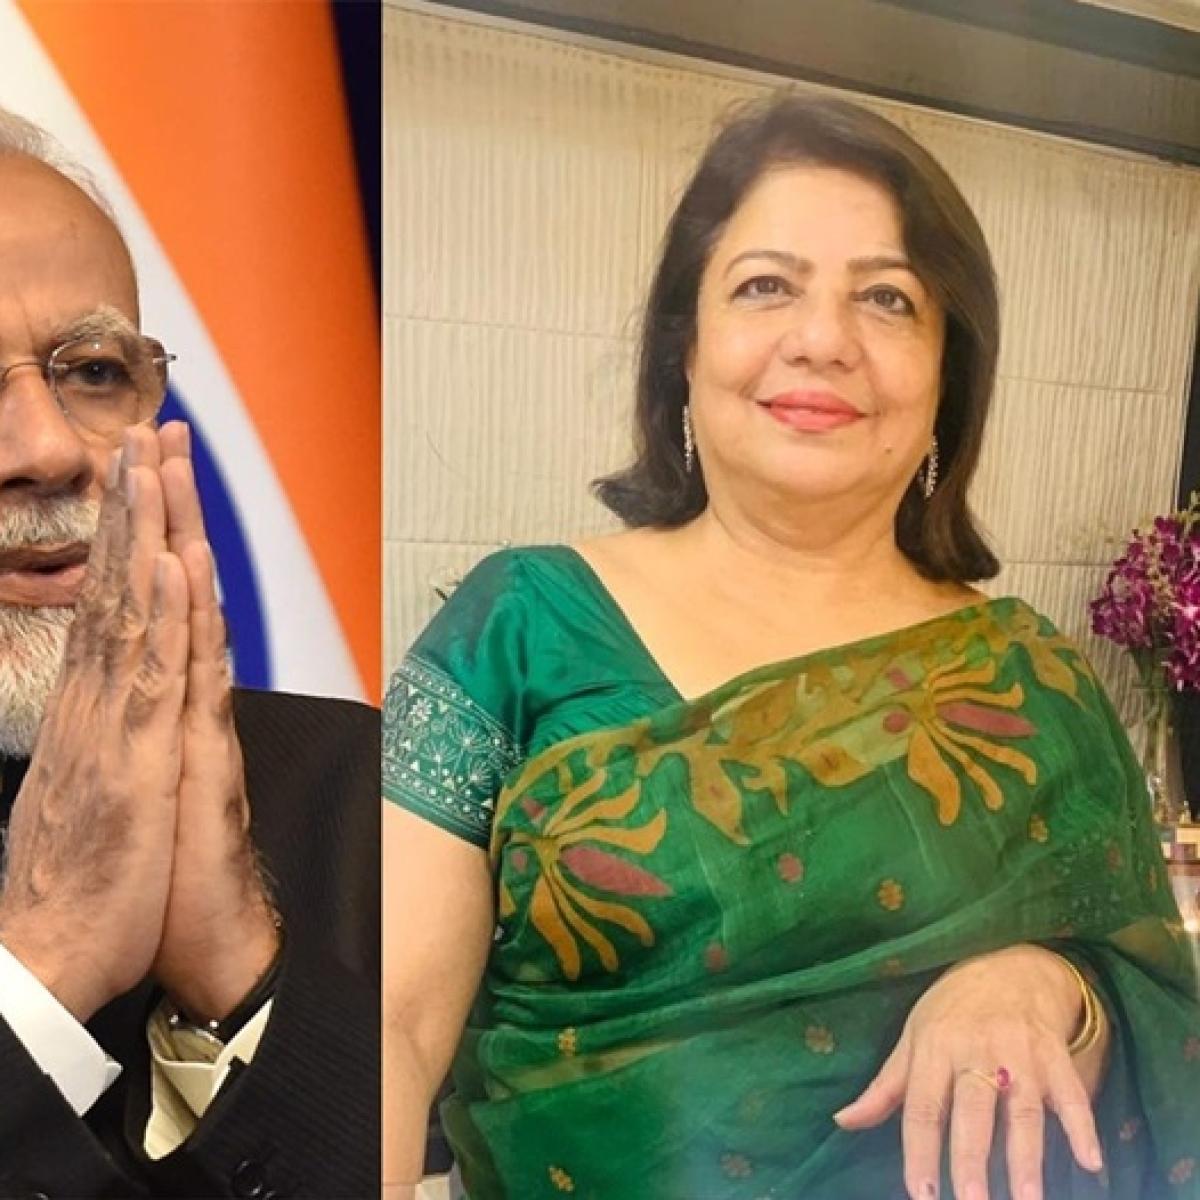 'But I stand rock solid behind YOU': Priyanka Chopra's mom Madhu Chopra pens an open letter to PM Modi amidst 39 deaths in Delhi